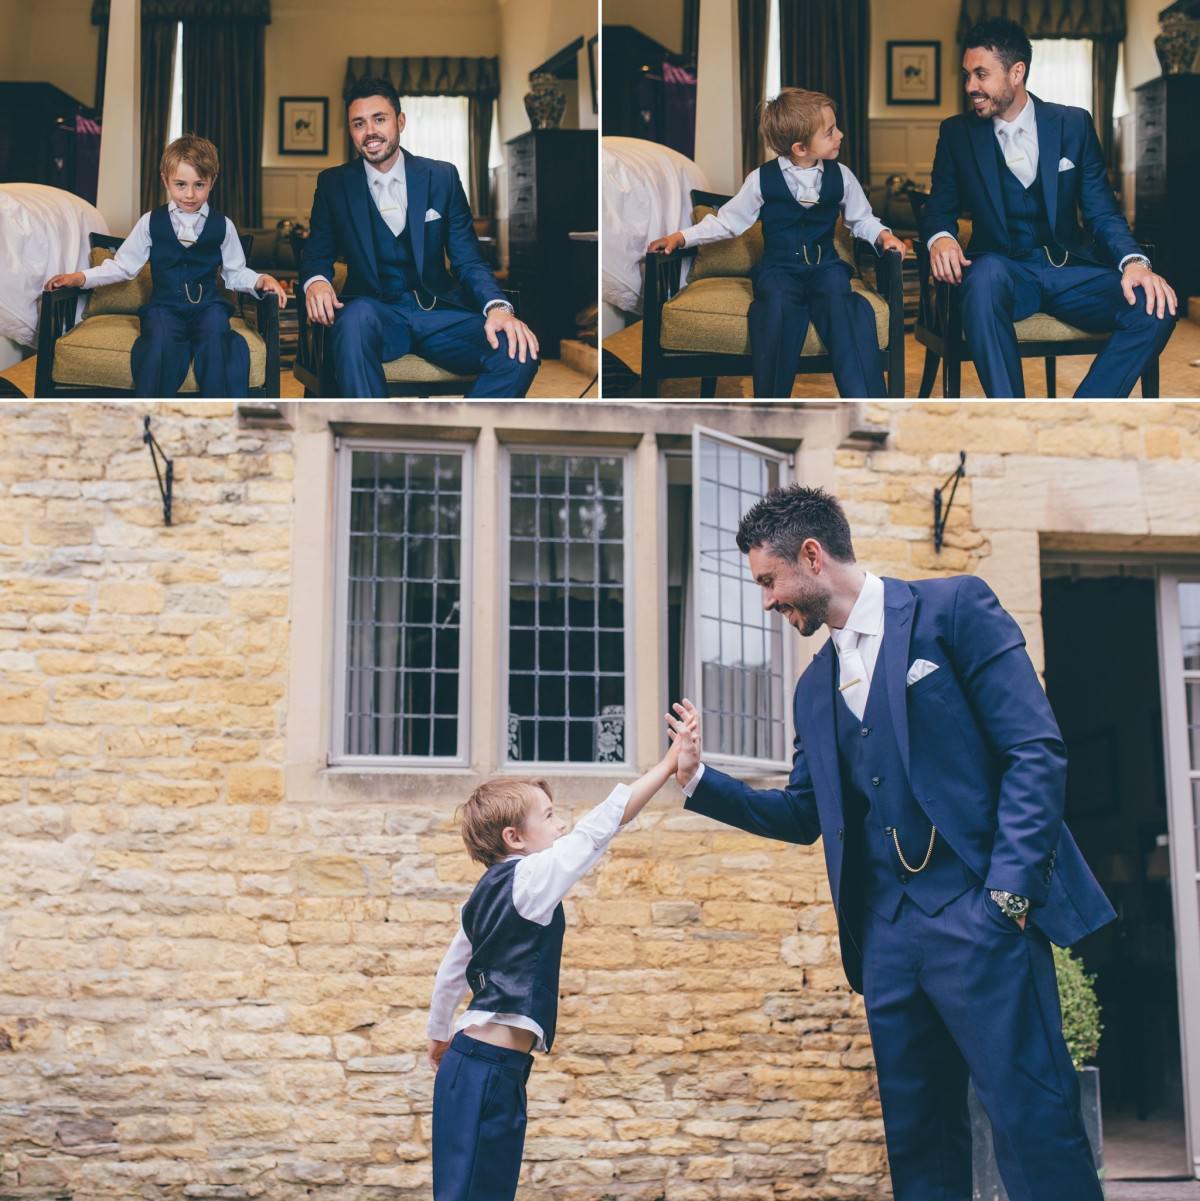 welsh_wedding_photographer_rachel_lambert_photography_lower_slaughter_manor_house_cotswolds_harriet_dean_ 6